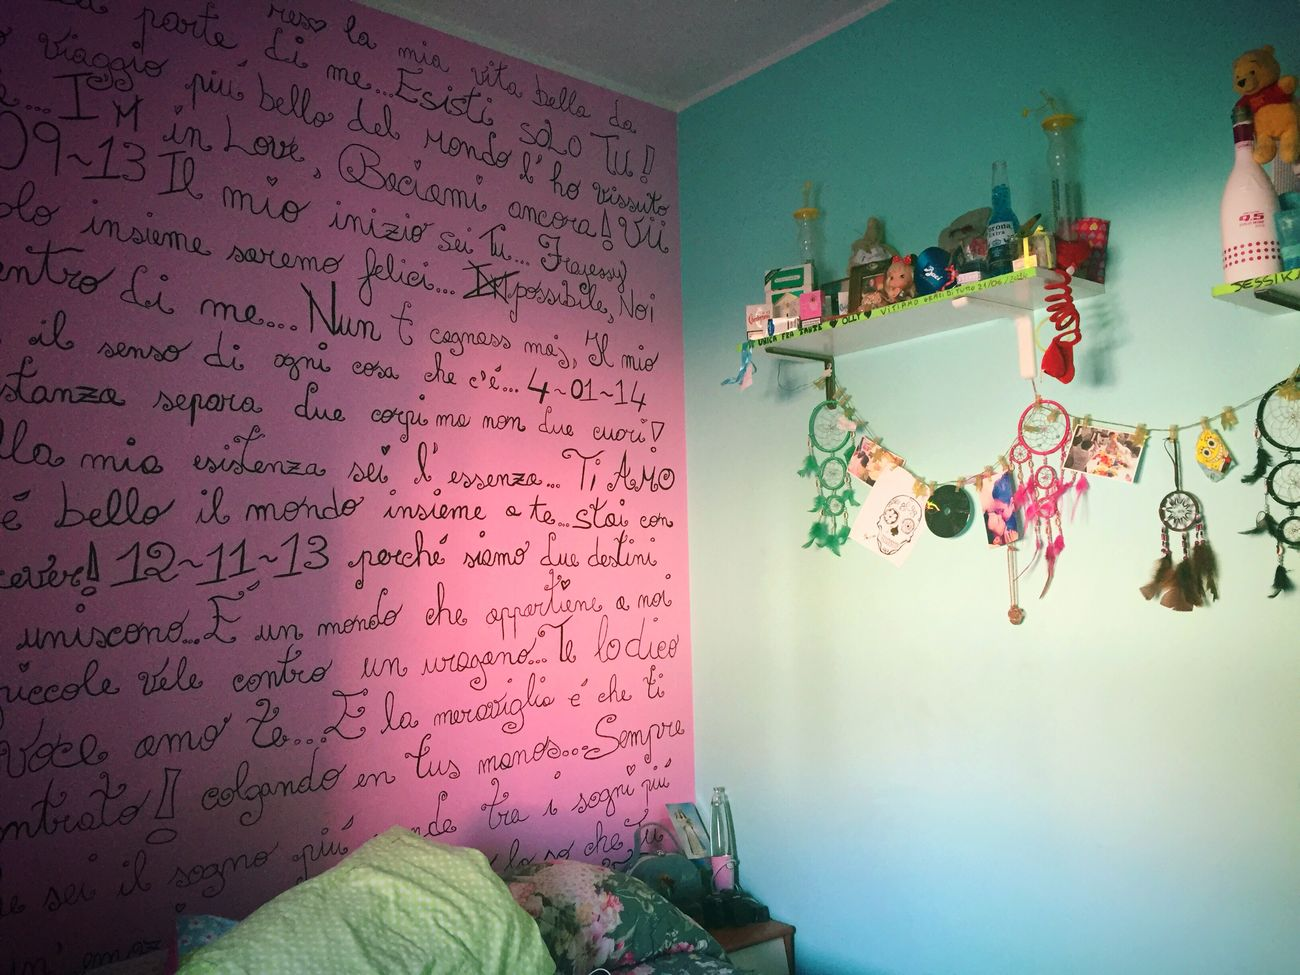 Pastel Power Room Pink Celeste Scritta Wall Dreamcatcher Draw